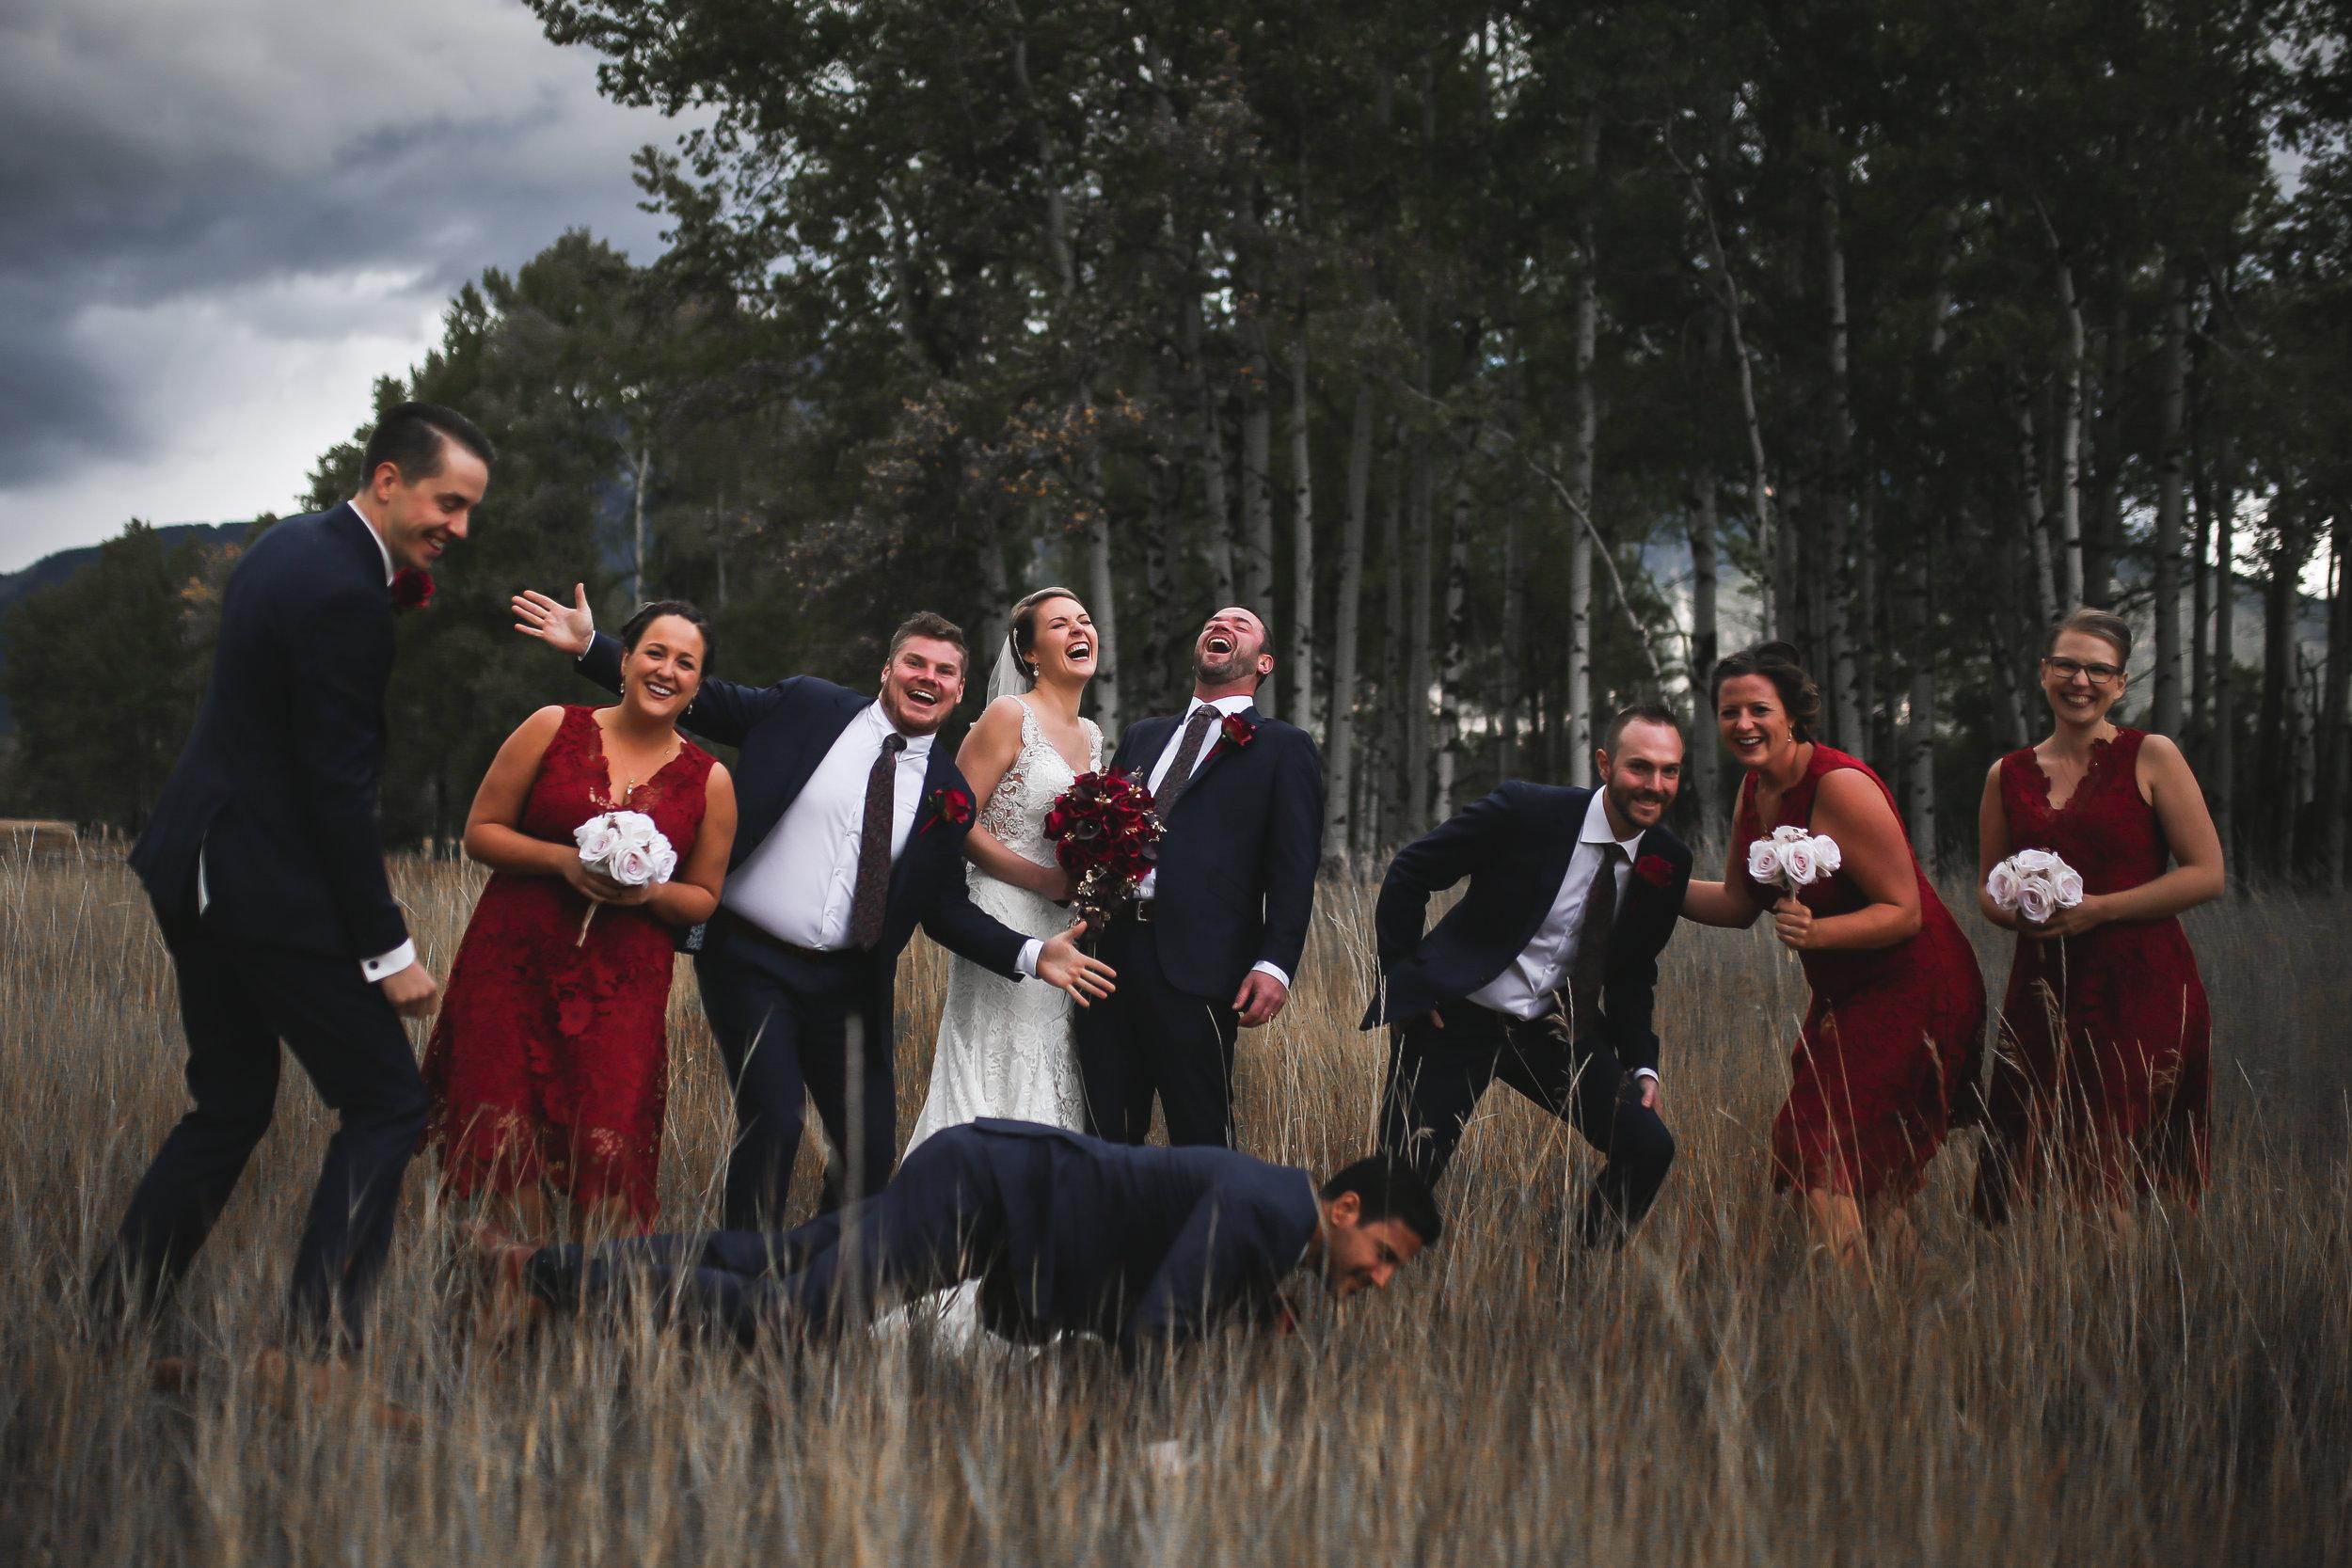 151 Adam Ziorio Photography - Vitoria wedding photographer Nick&Bree Fernie Wedding.jpg